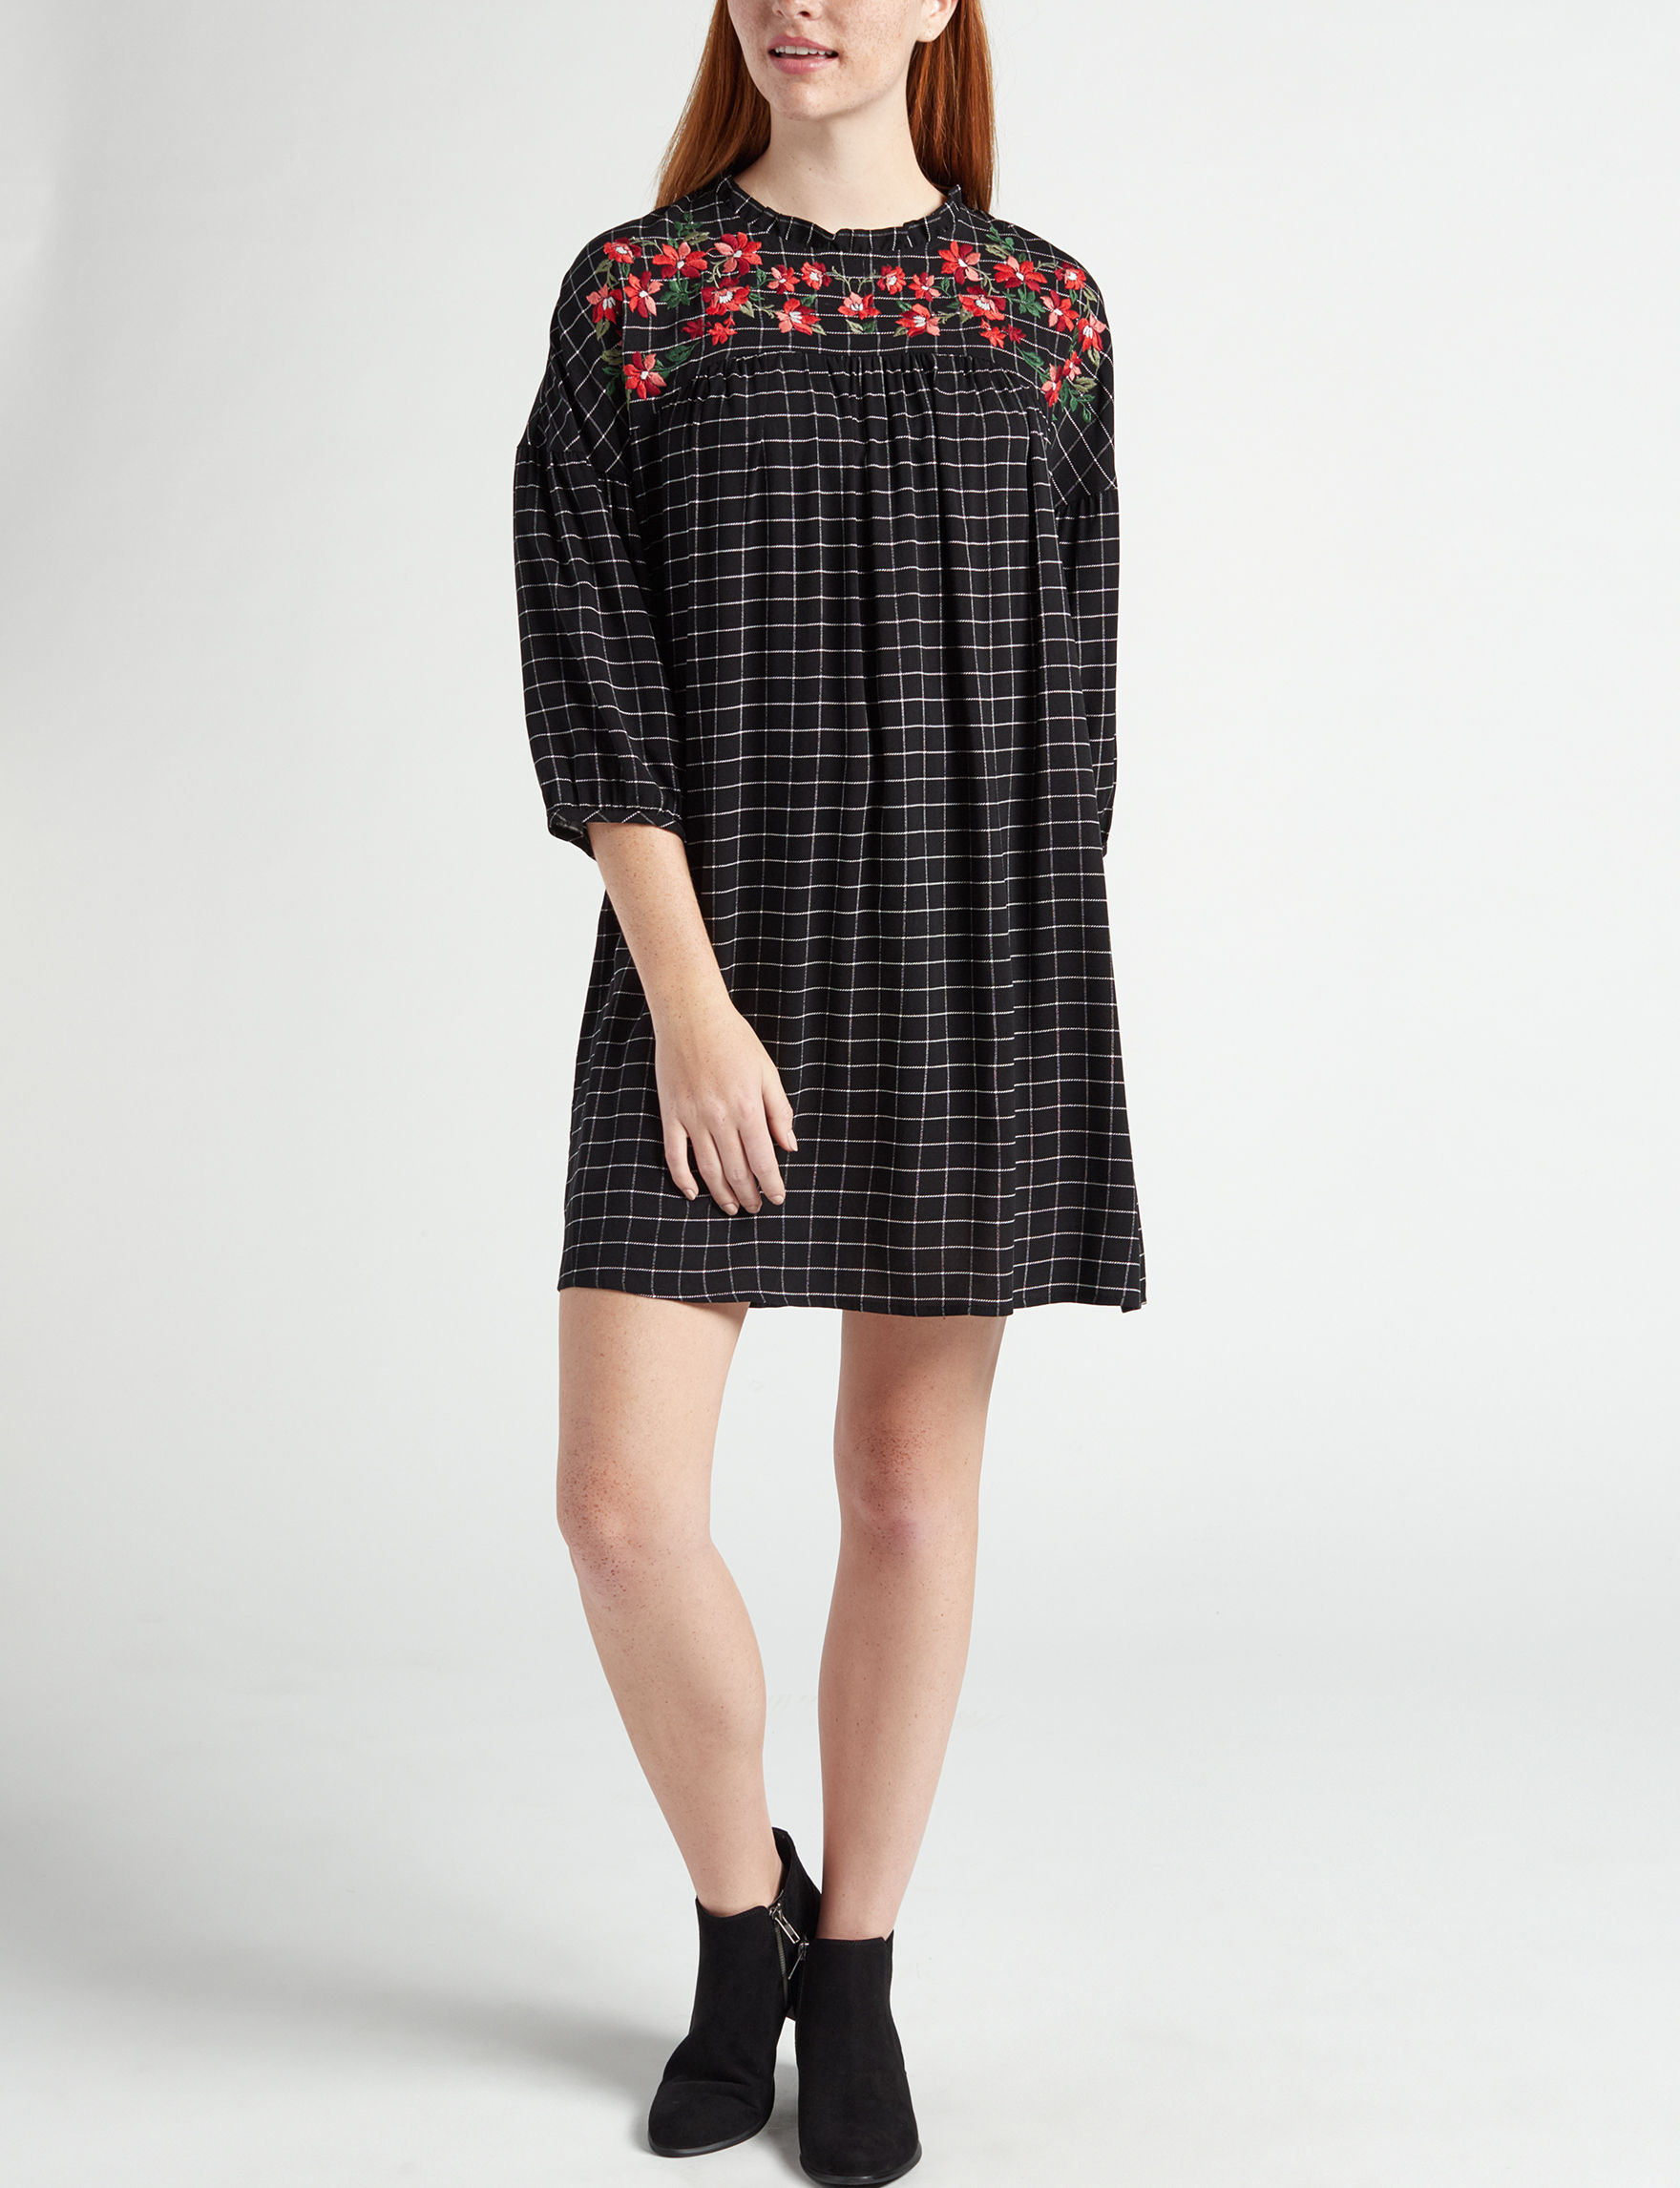 BeBop Black Everyday & Casual Shift Dresses